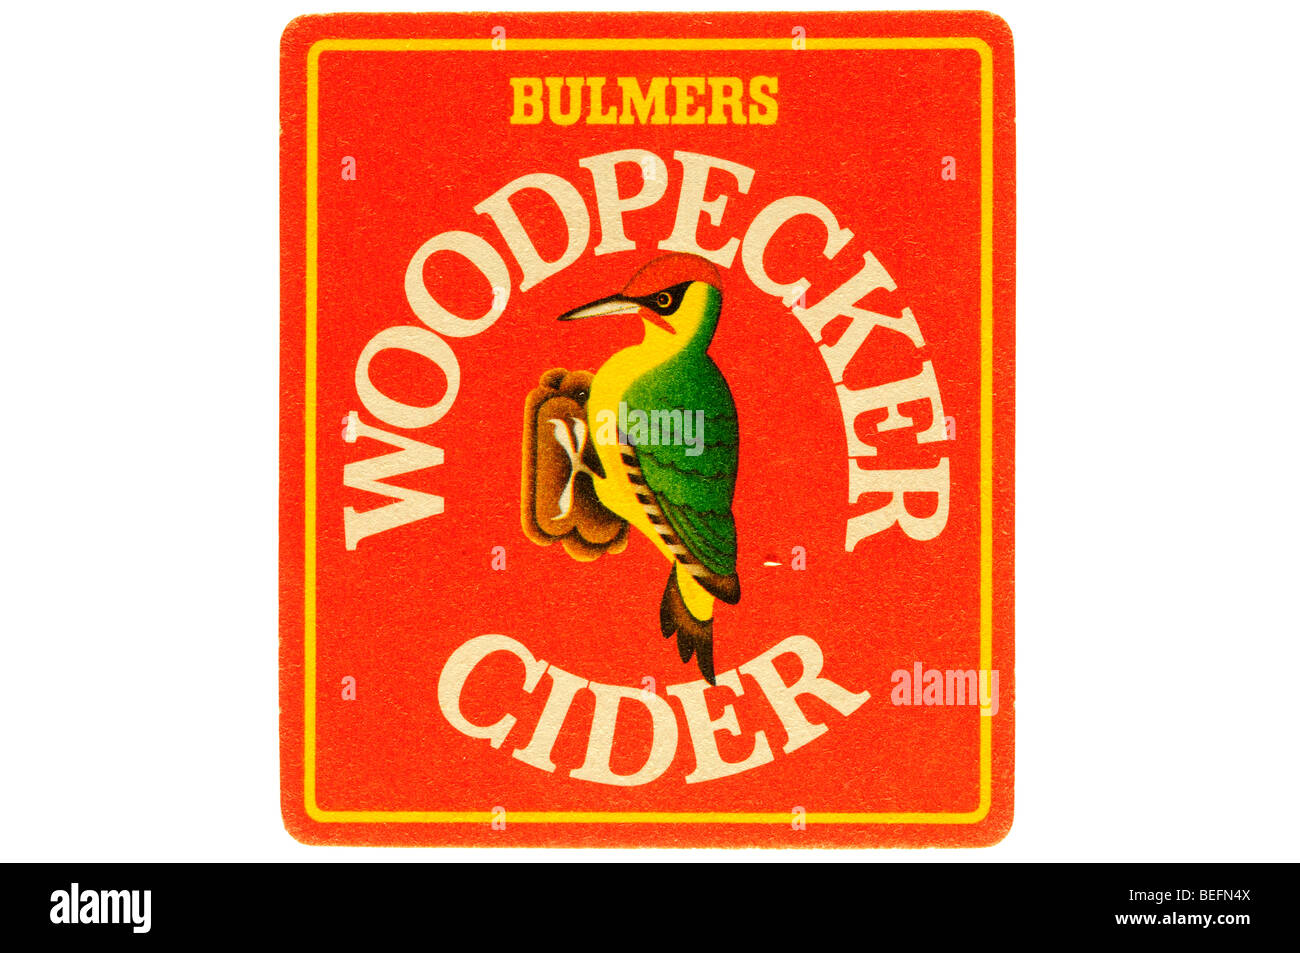 bulmers woodpecker cider beer mat Stock Photo